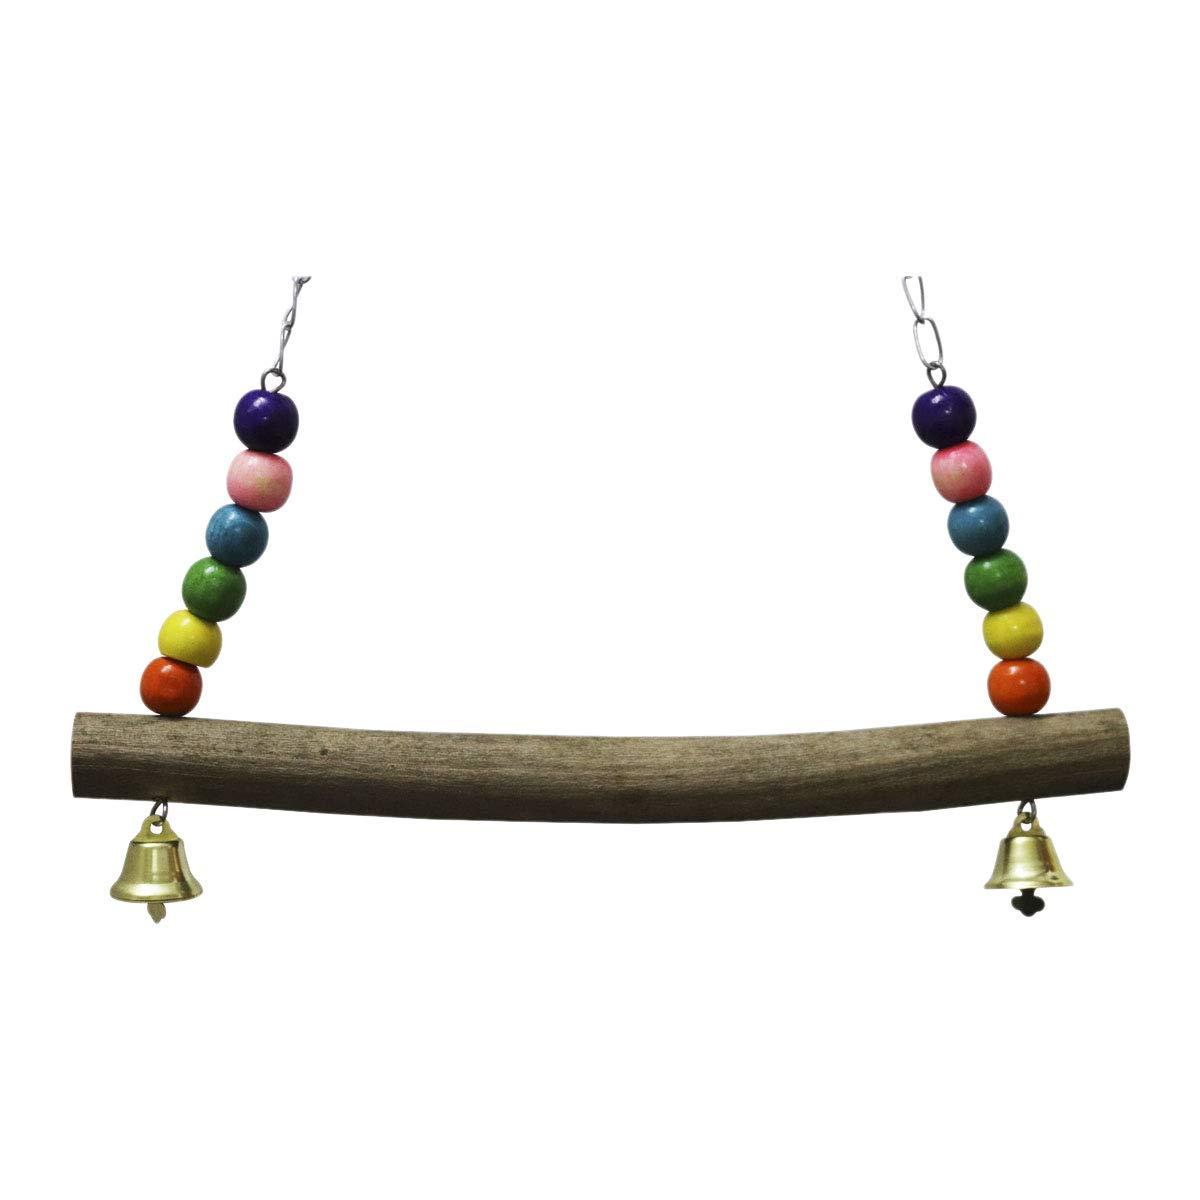 AKAMAS Parrot Trainning Chicken Swing Wooden Large Bird Parrot Trainning Colorful Chicken Toys For Hens Bird